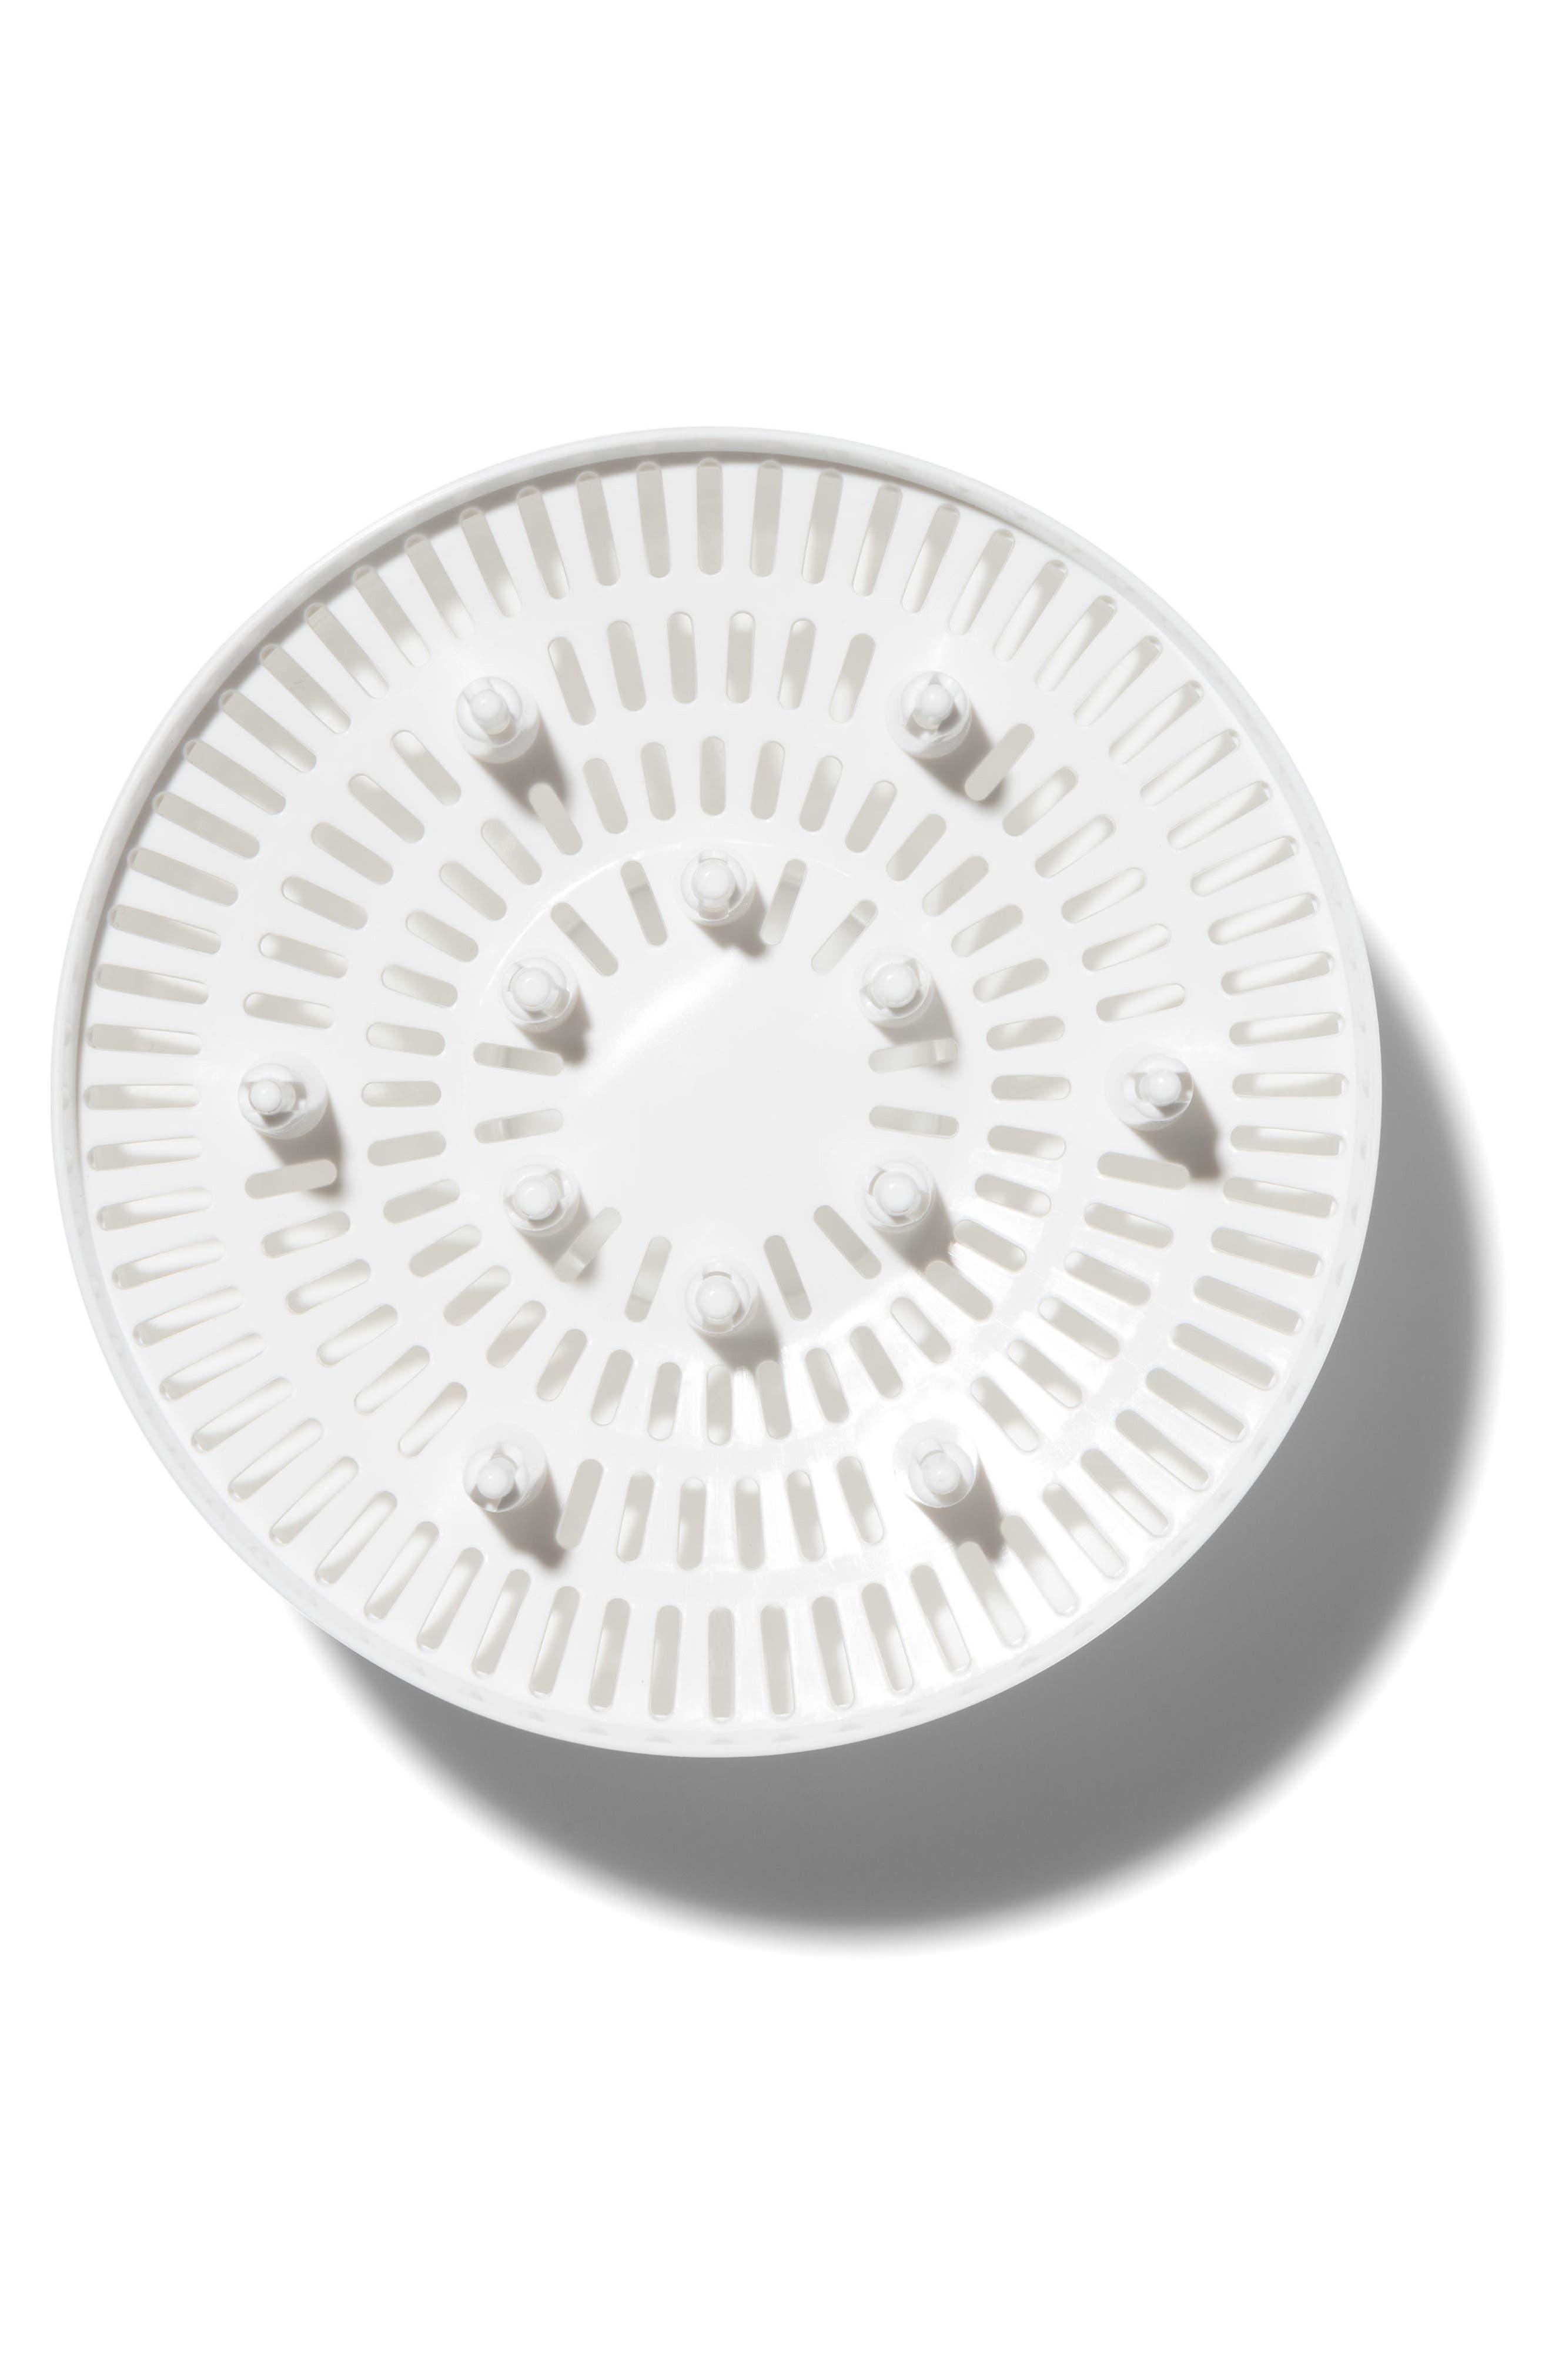 T3 White SoftCurl Diffuser, Main, color, WHITE/ ROSE GOLD